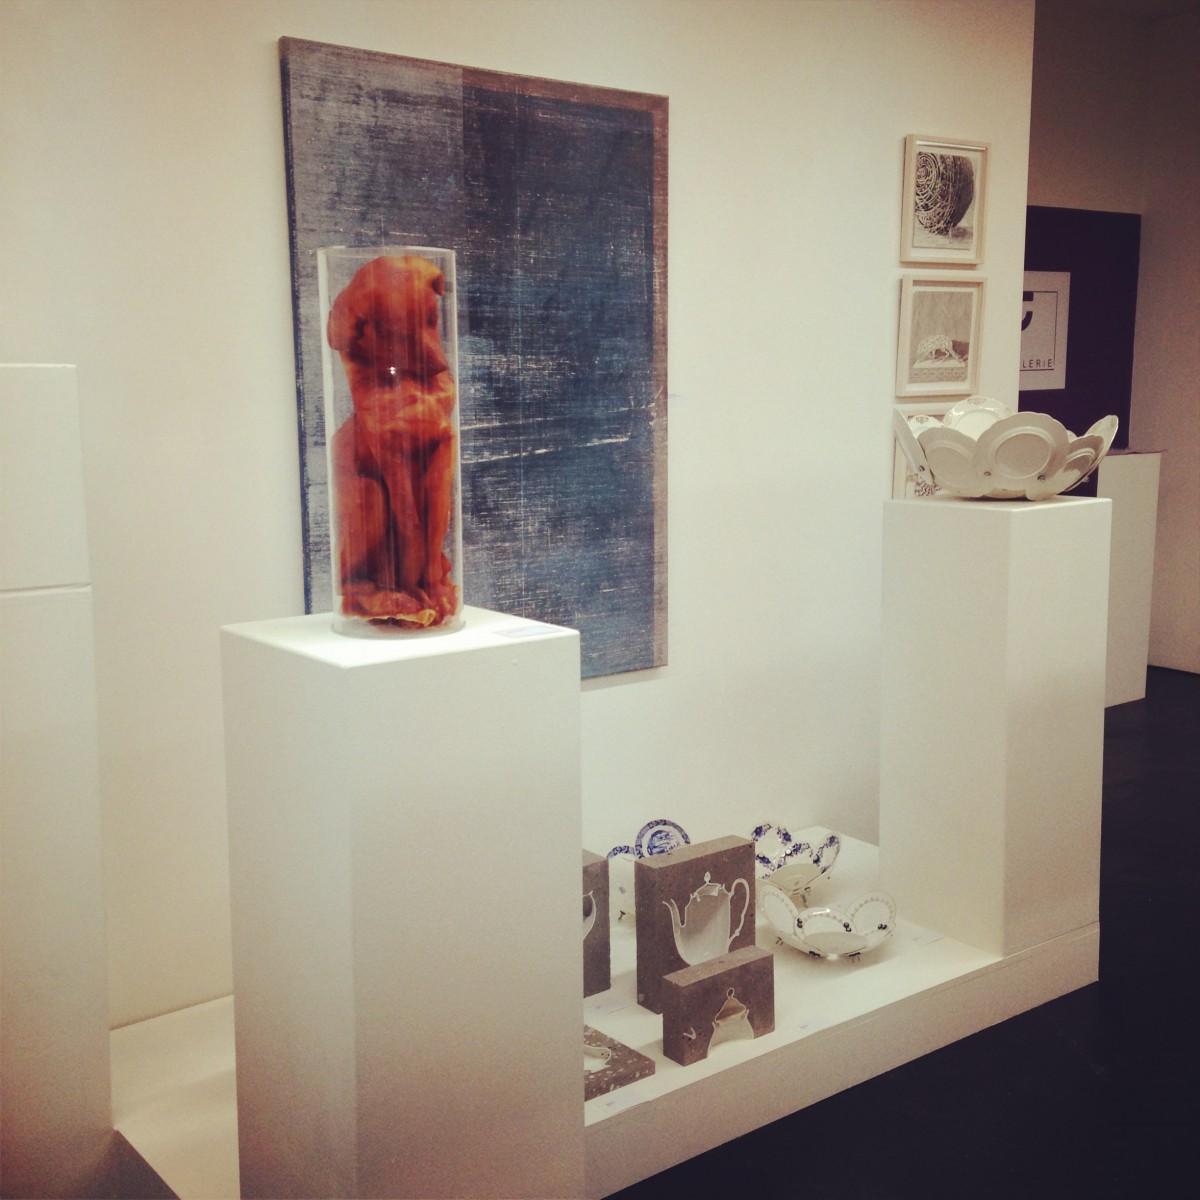 Xandra Bremers, Patrick Ceyssens, Studio Rolf.fr